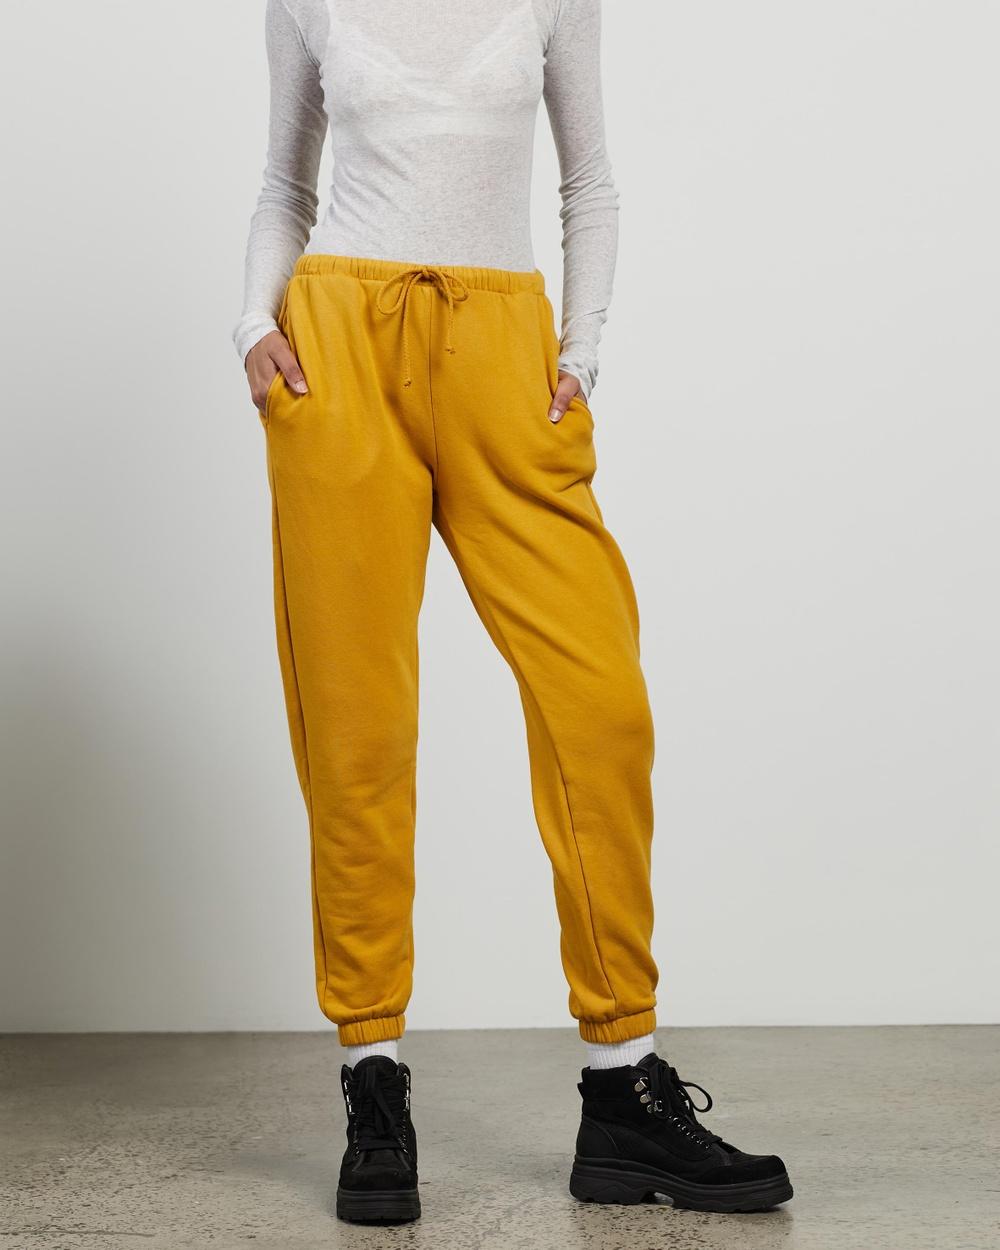 American Vintage Fobye Joggers Sweatpants Vintage Tawny